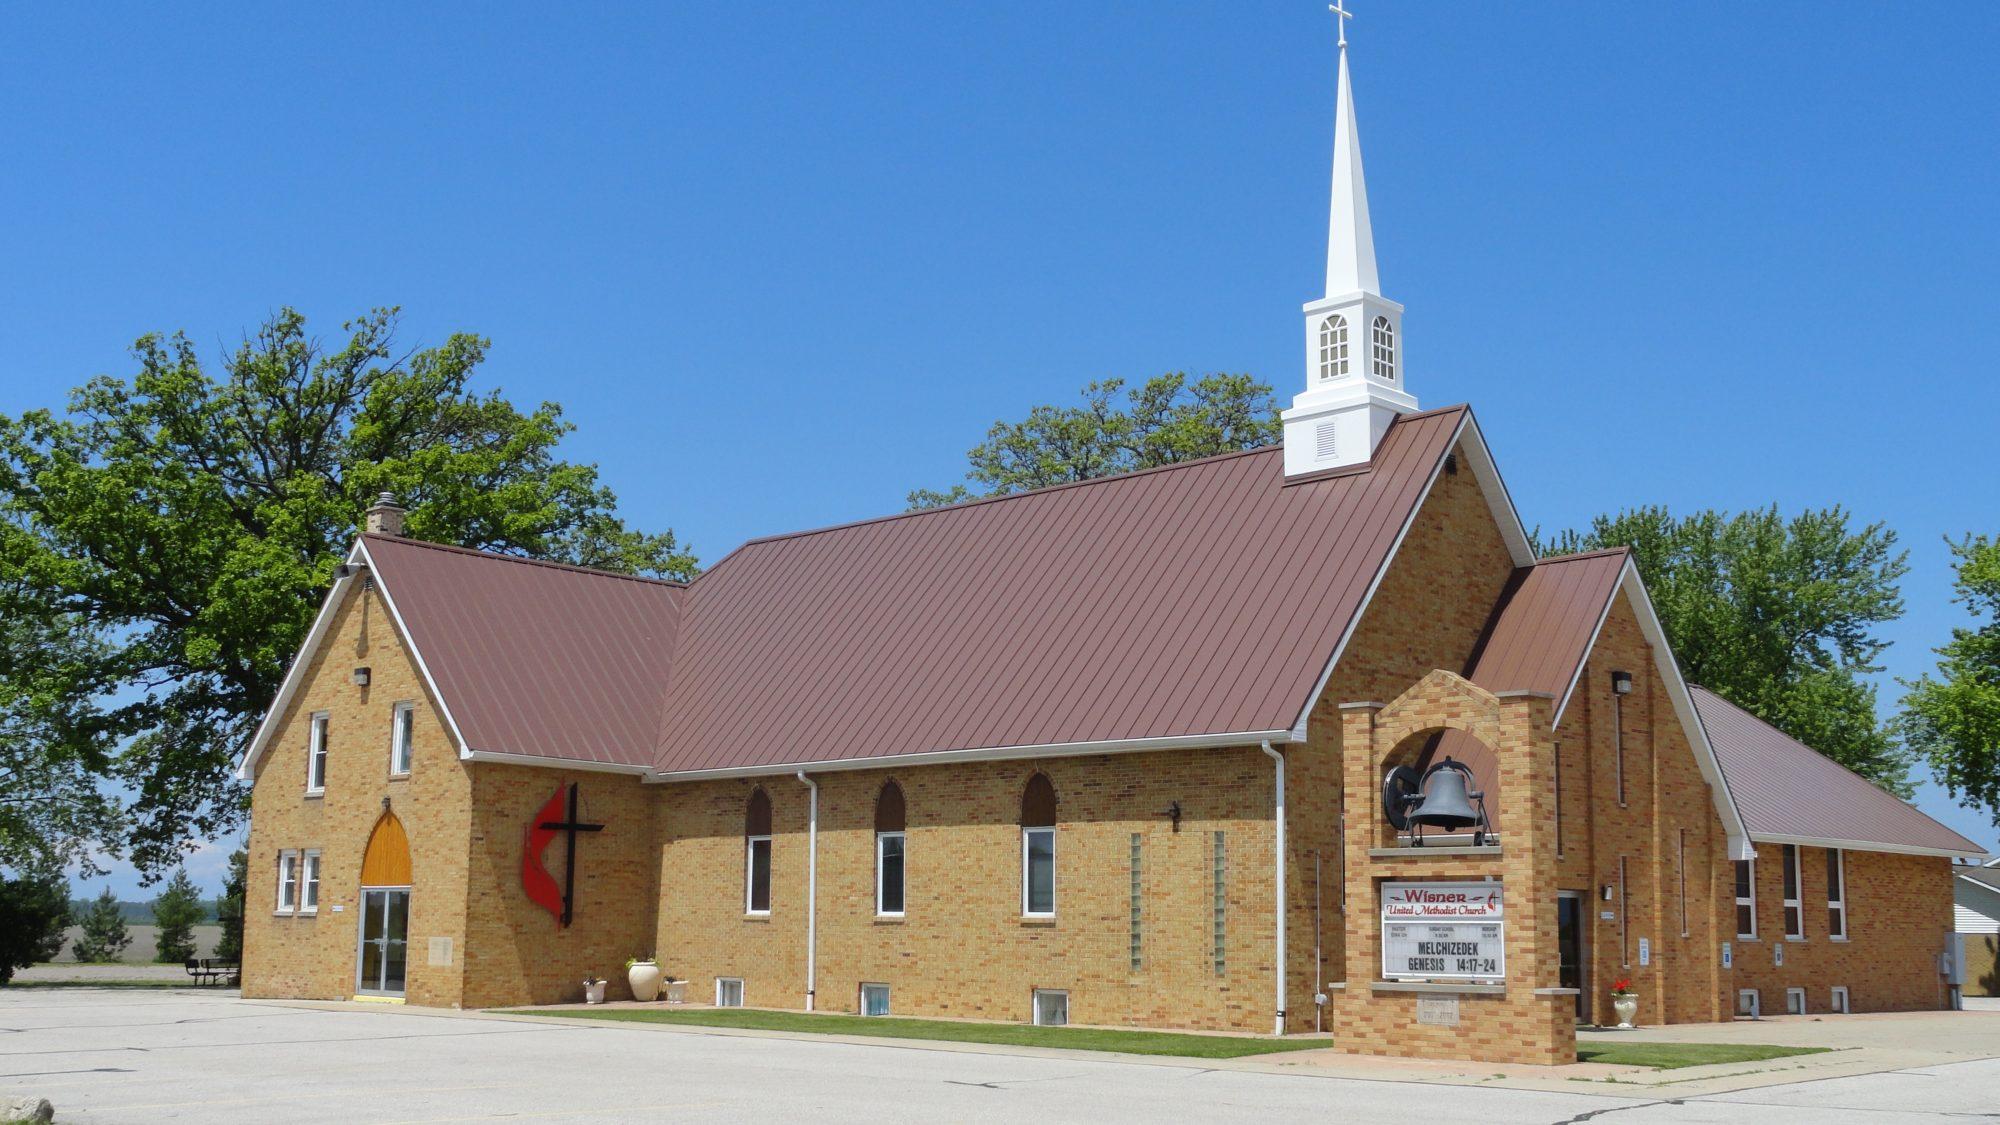 Wisner United Methodist Church